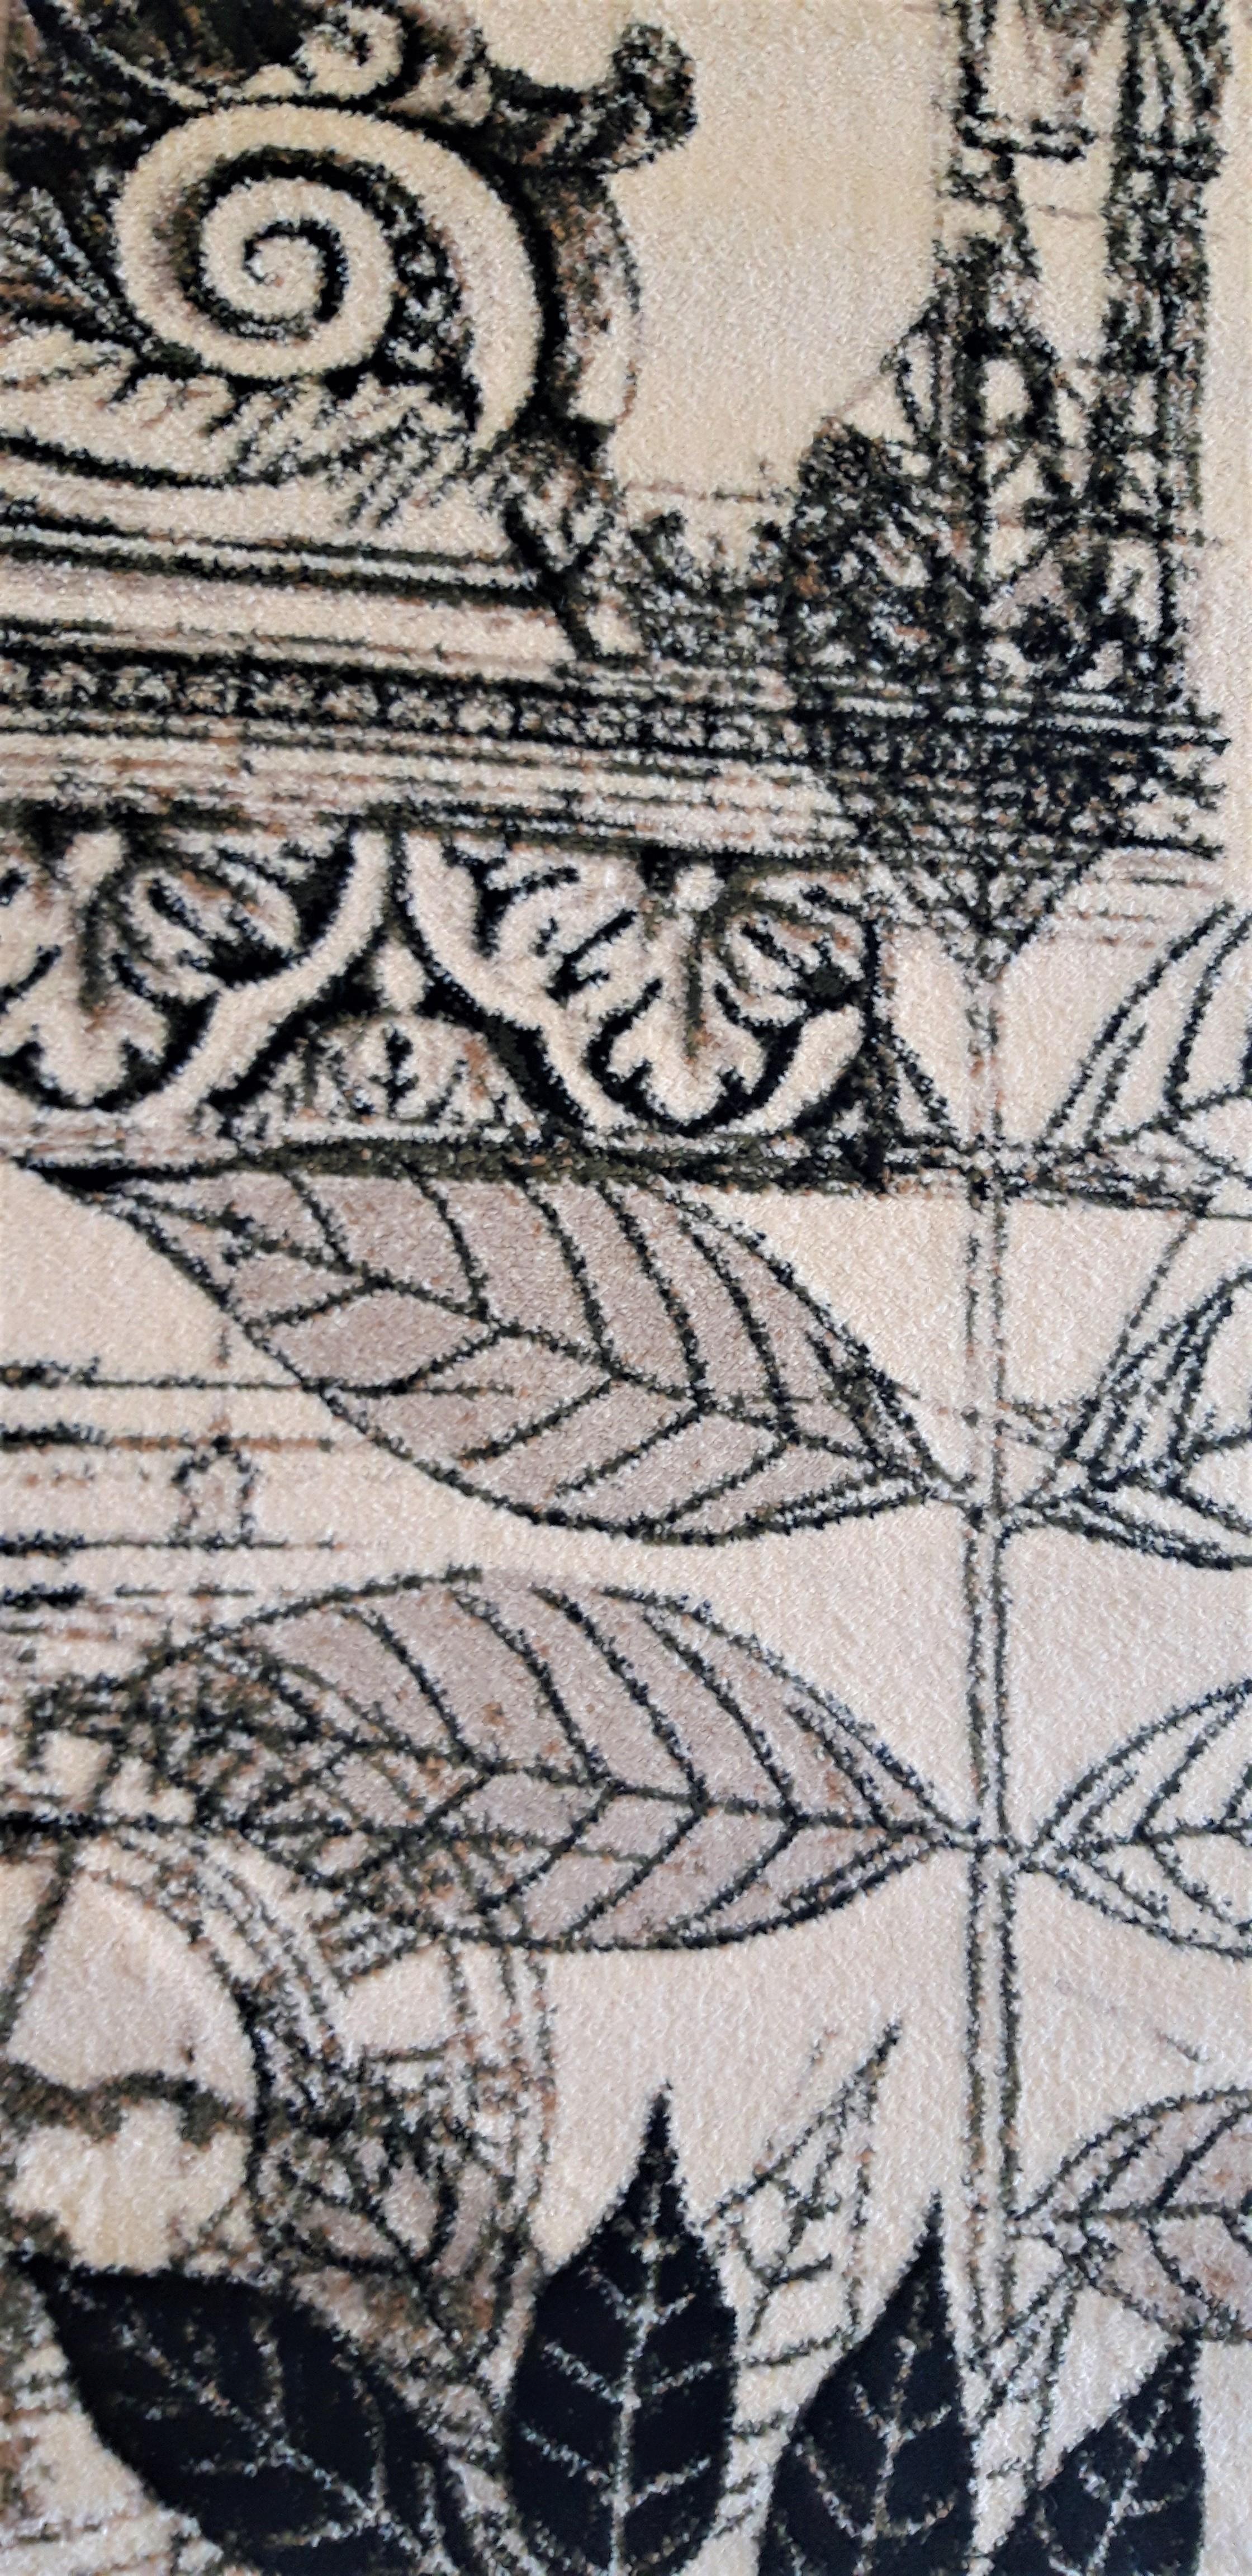 Covor Modern, Lotos Frunze 1545, Crem / Bej / Gri, Oval, 120x170 cm, 1800 gr/mp [5]